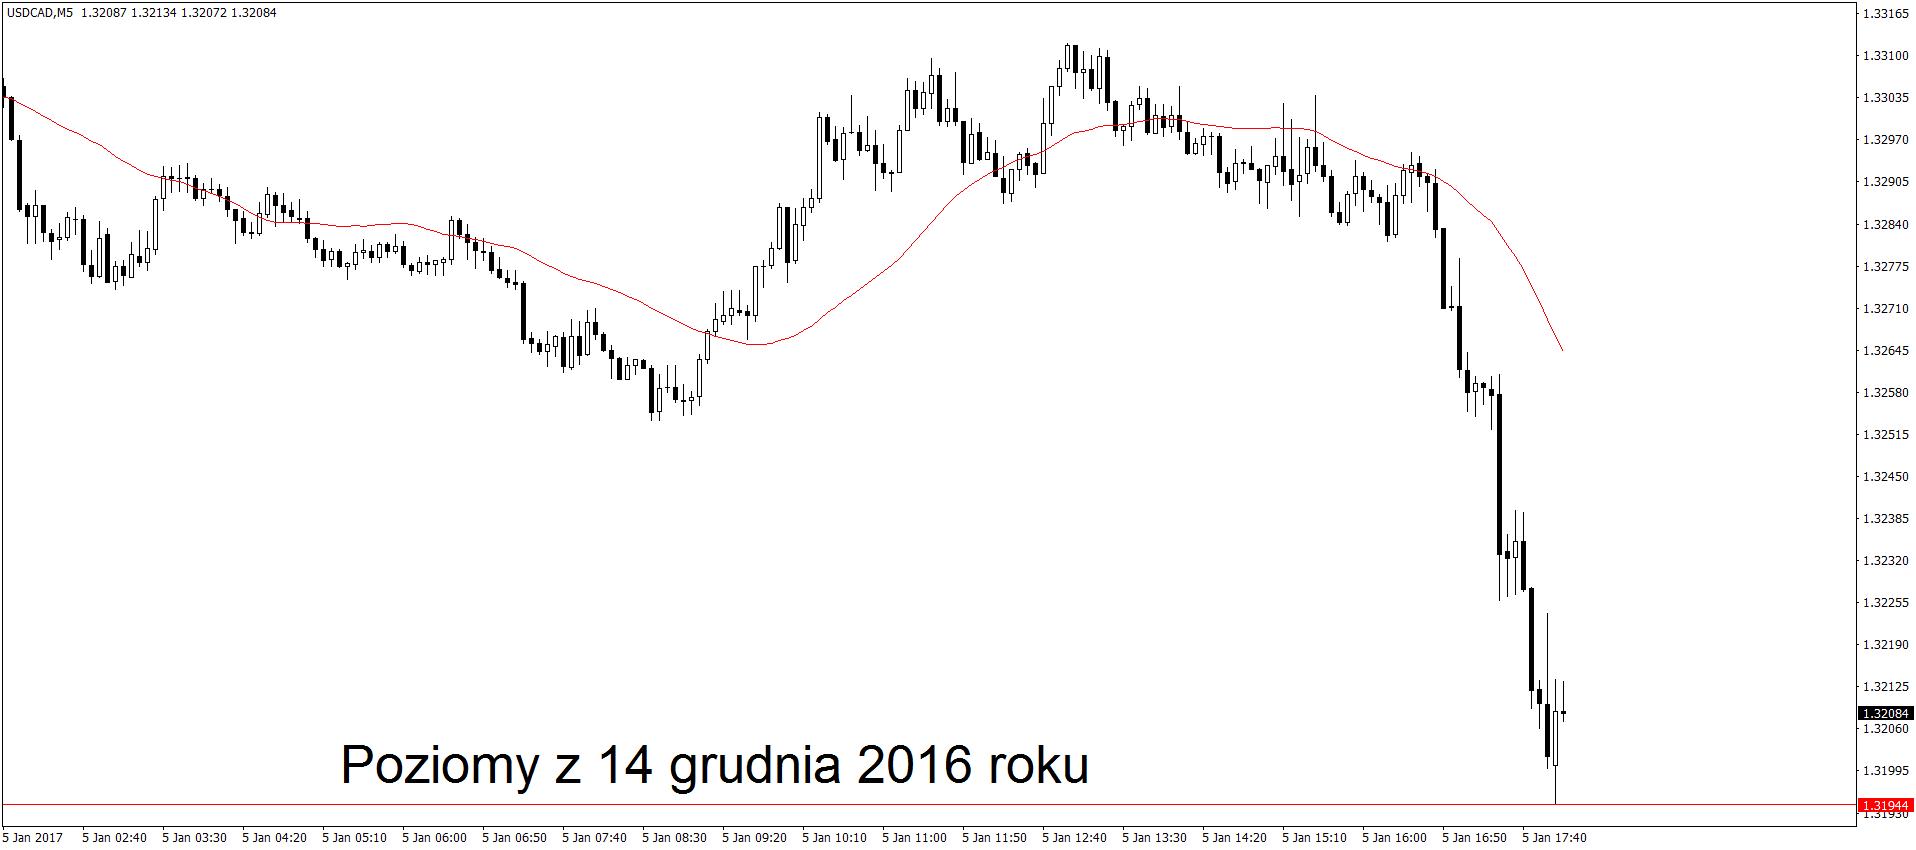 USD/CAD M5